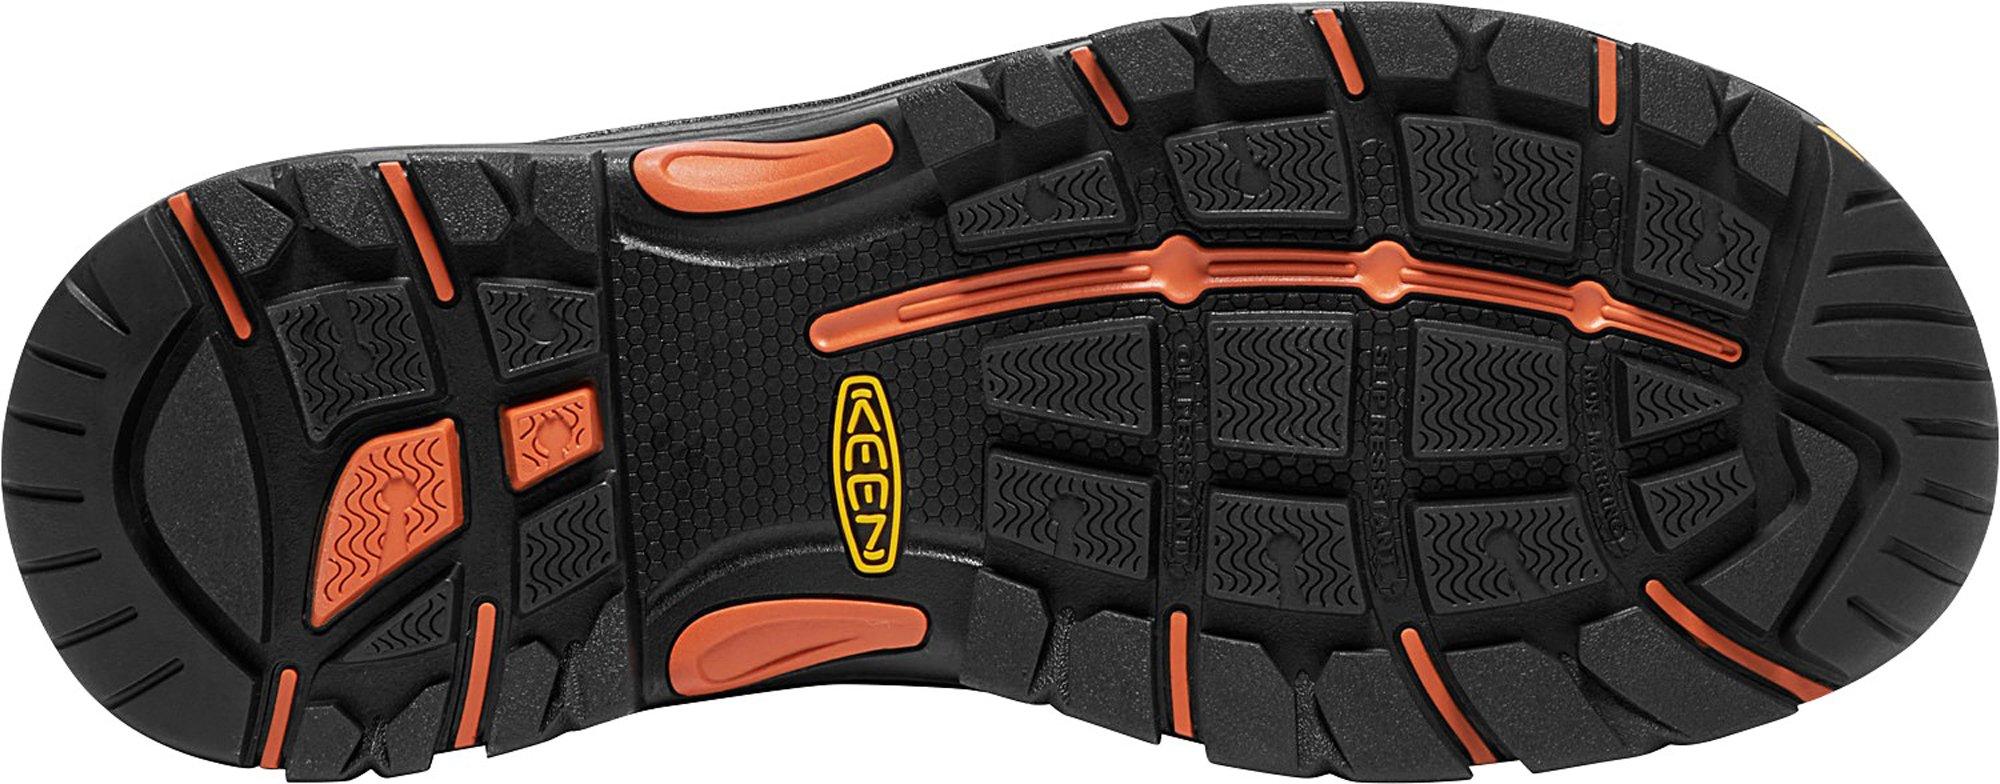 KEEN Utility Coburg 6'' WP (Steel Toe), Men's Work Boot, Cascade Brown/Brindle, 8 EE by KEEN Utility (Image #4)